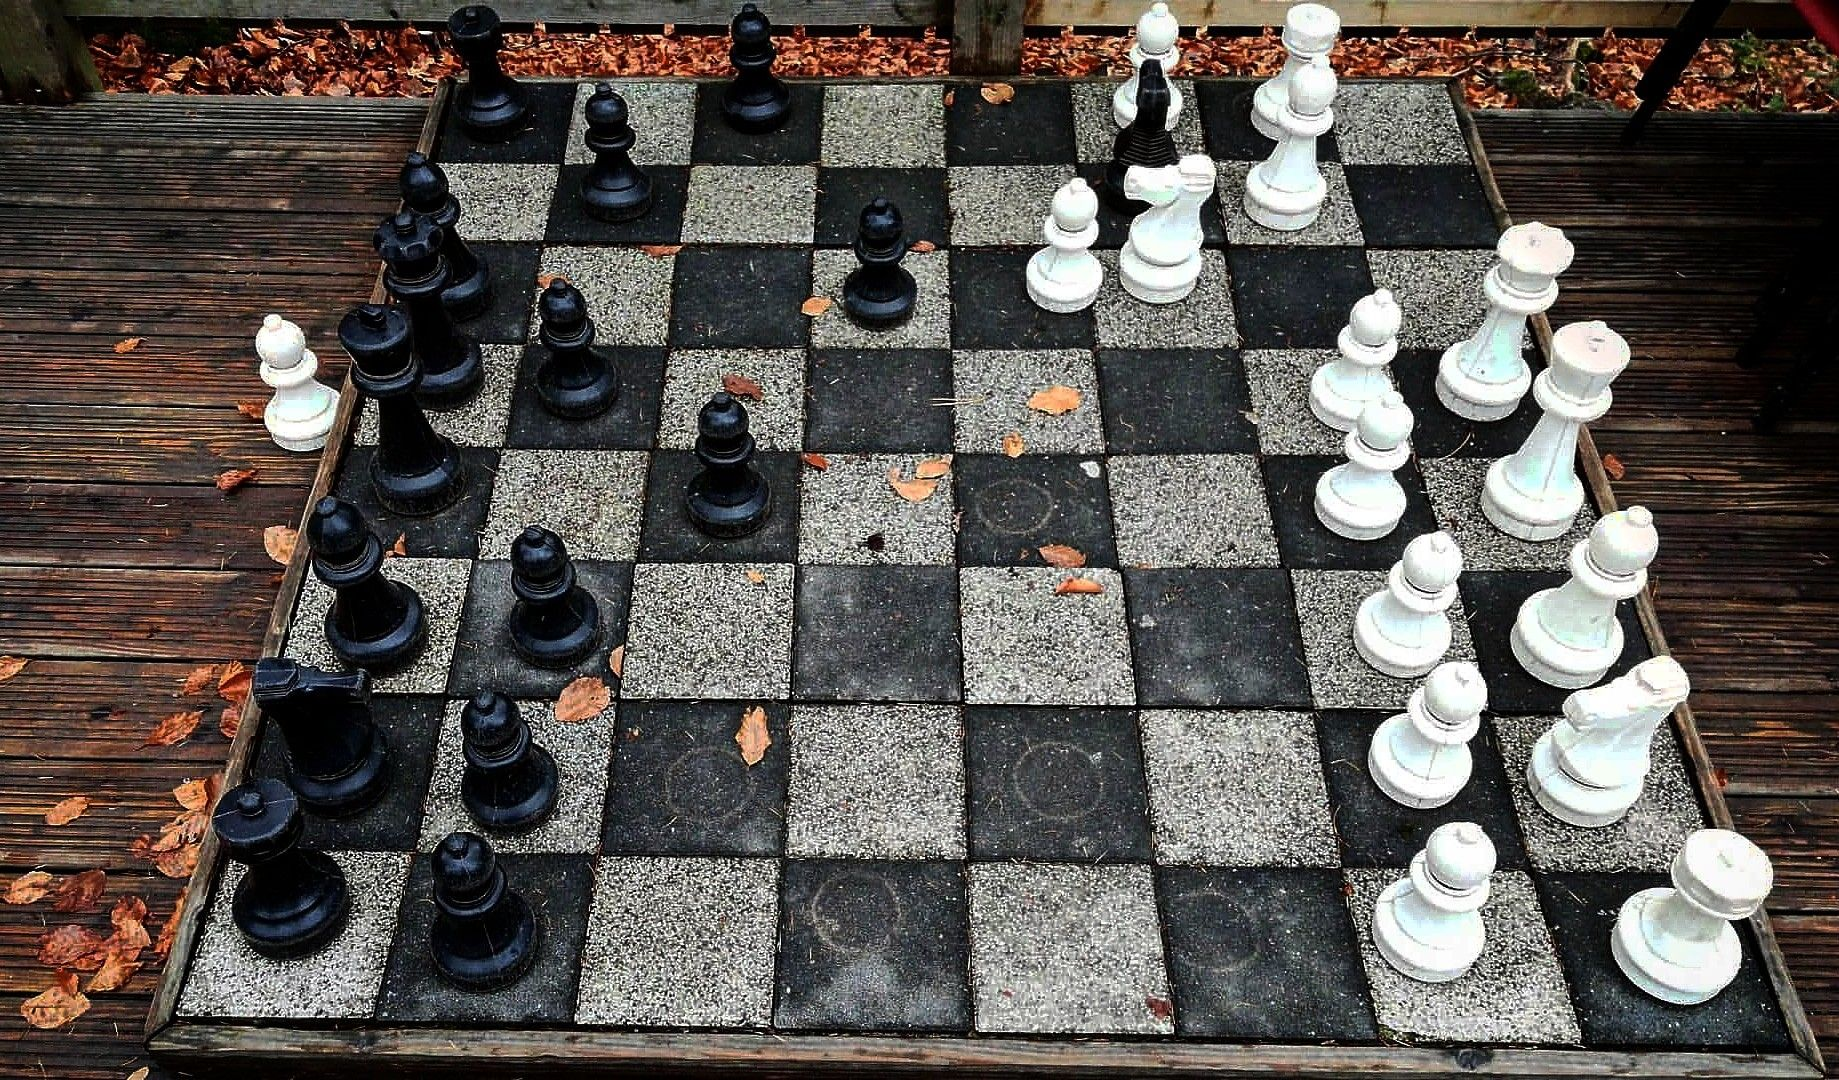 Sah Mat Chess Board Contemporary Rug Decor